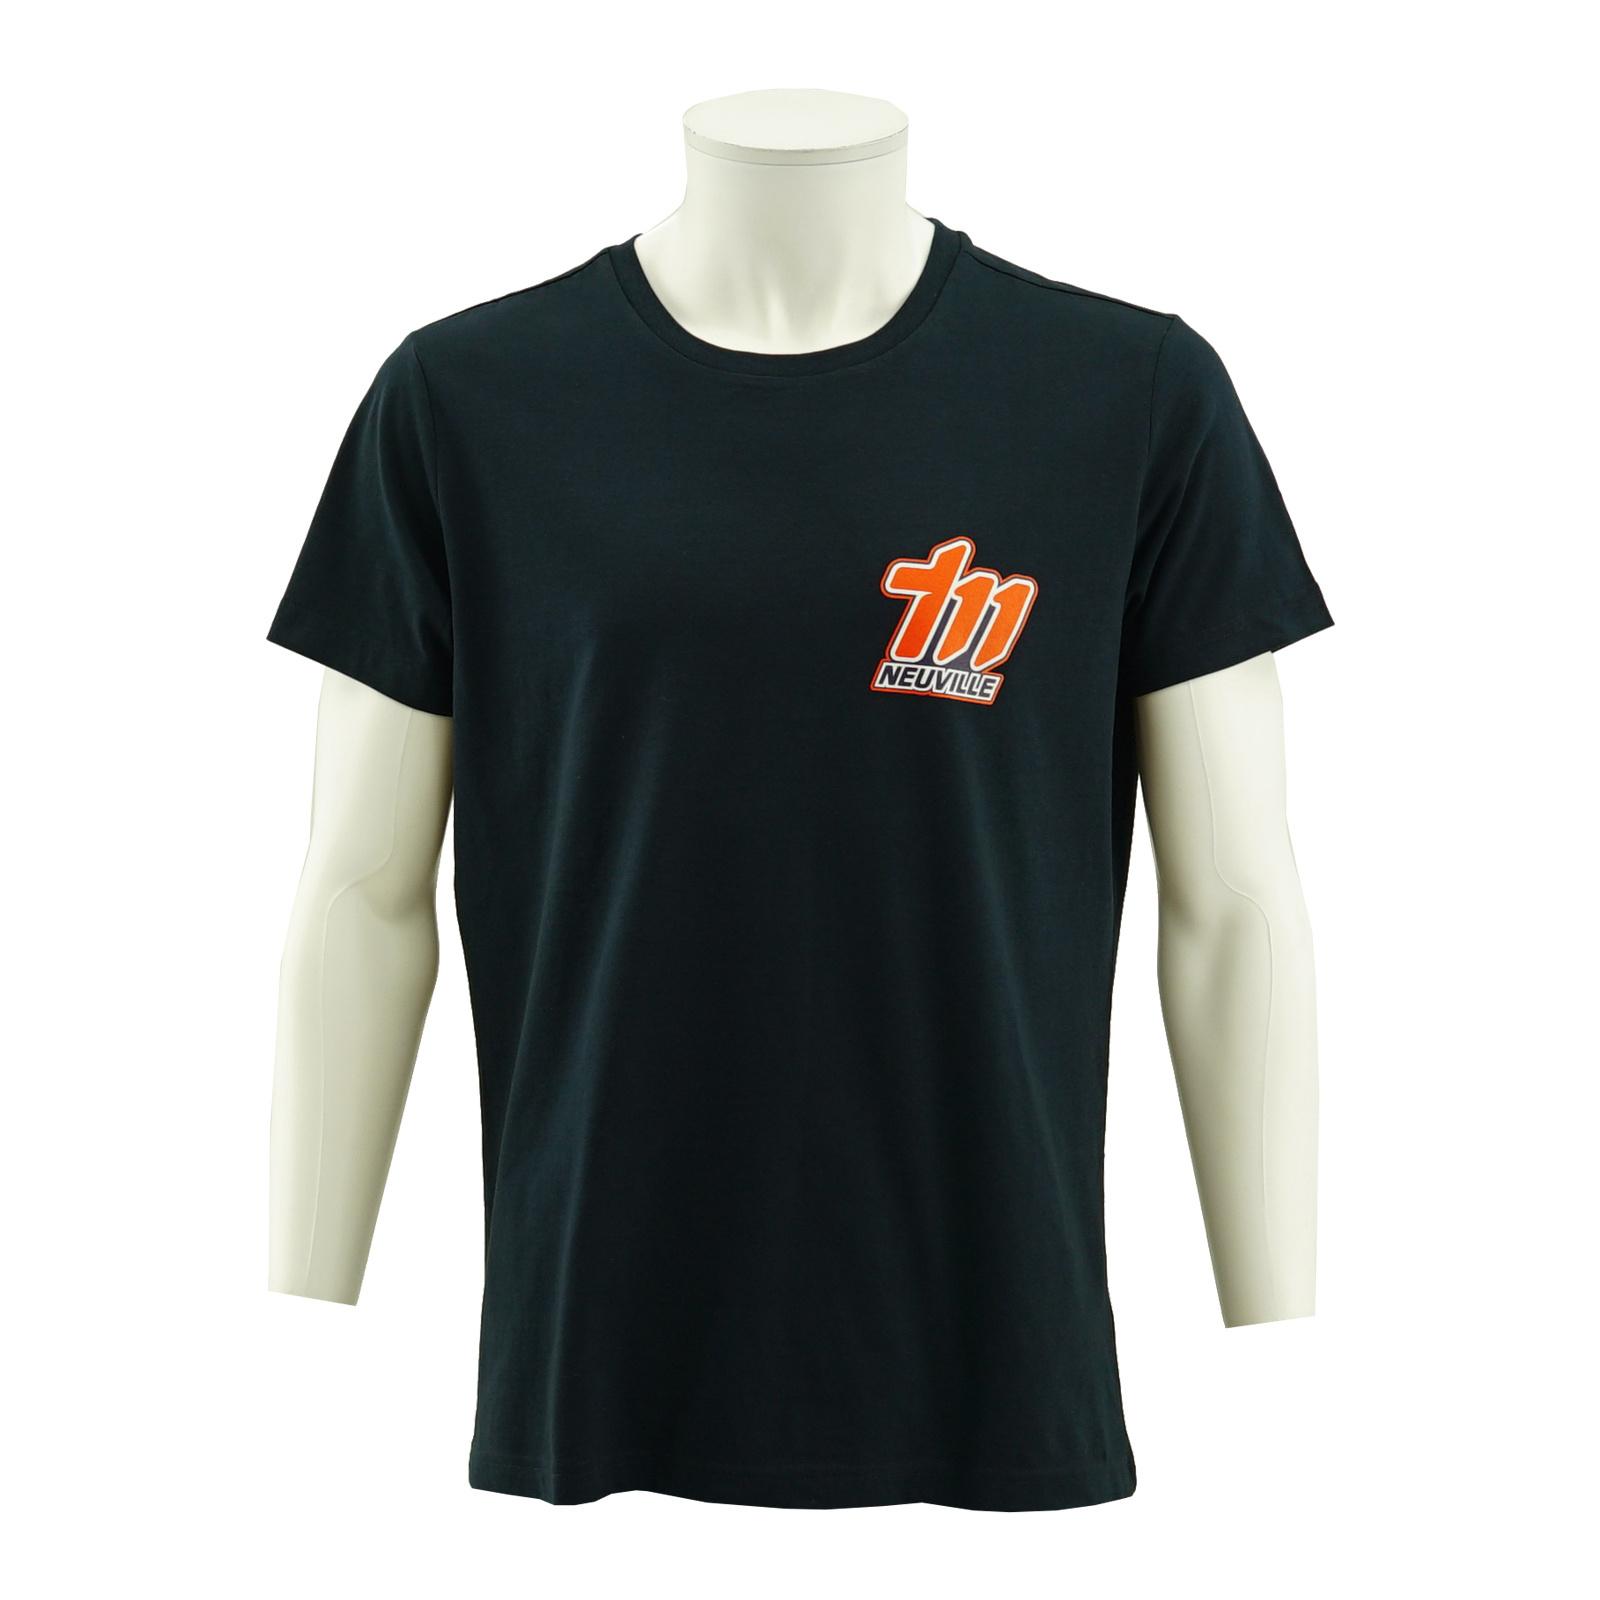 Topfanz T-shirt TN11 Navy